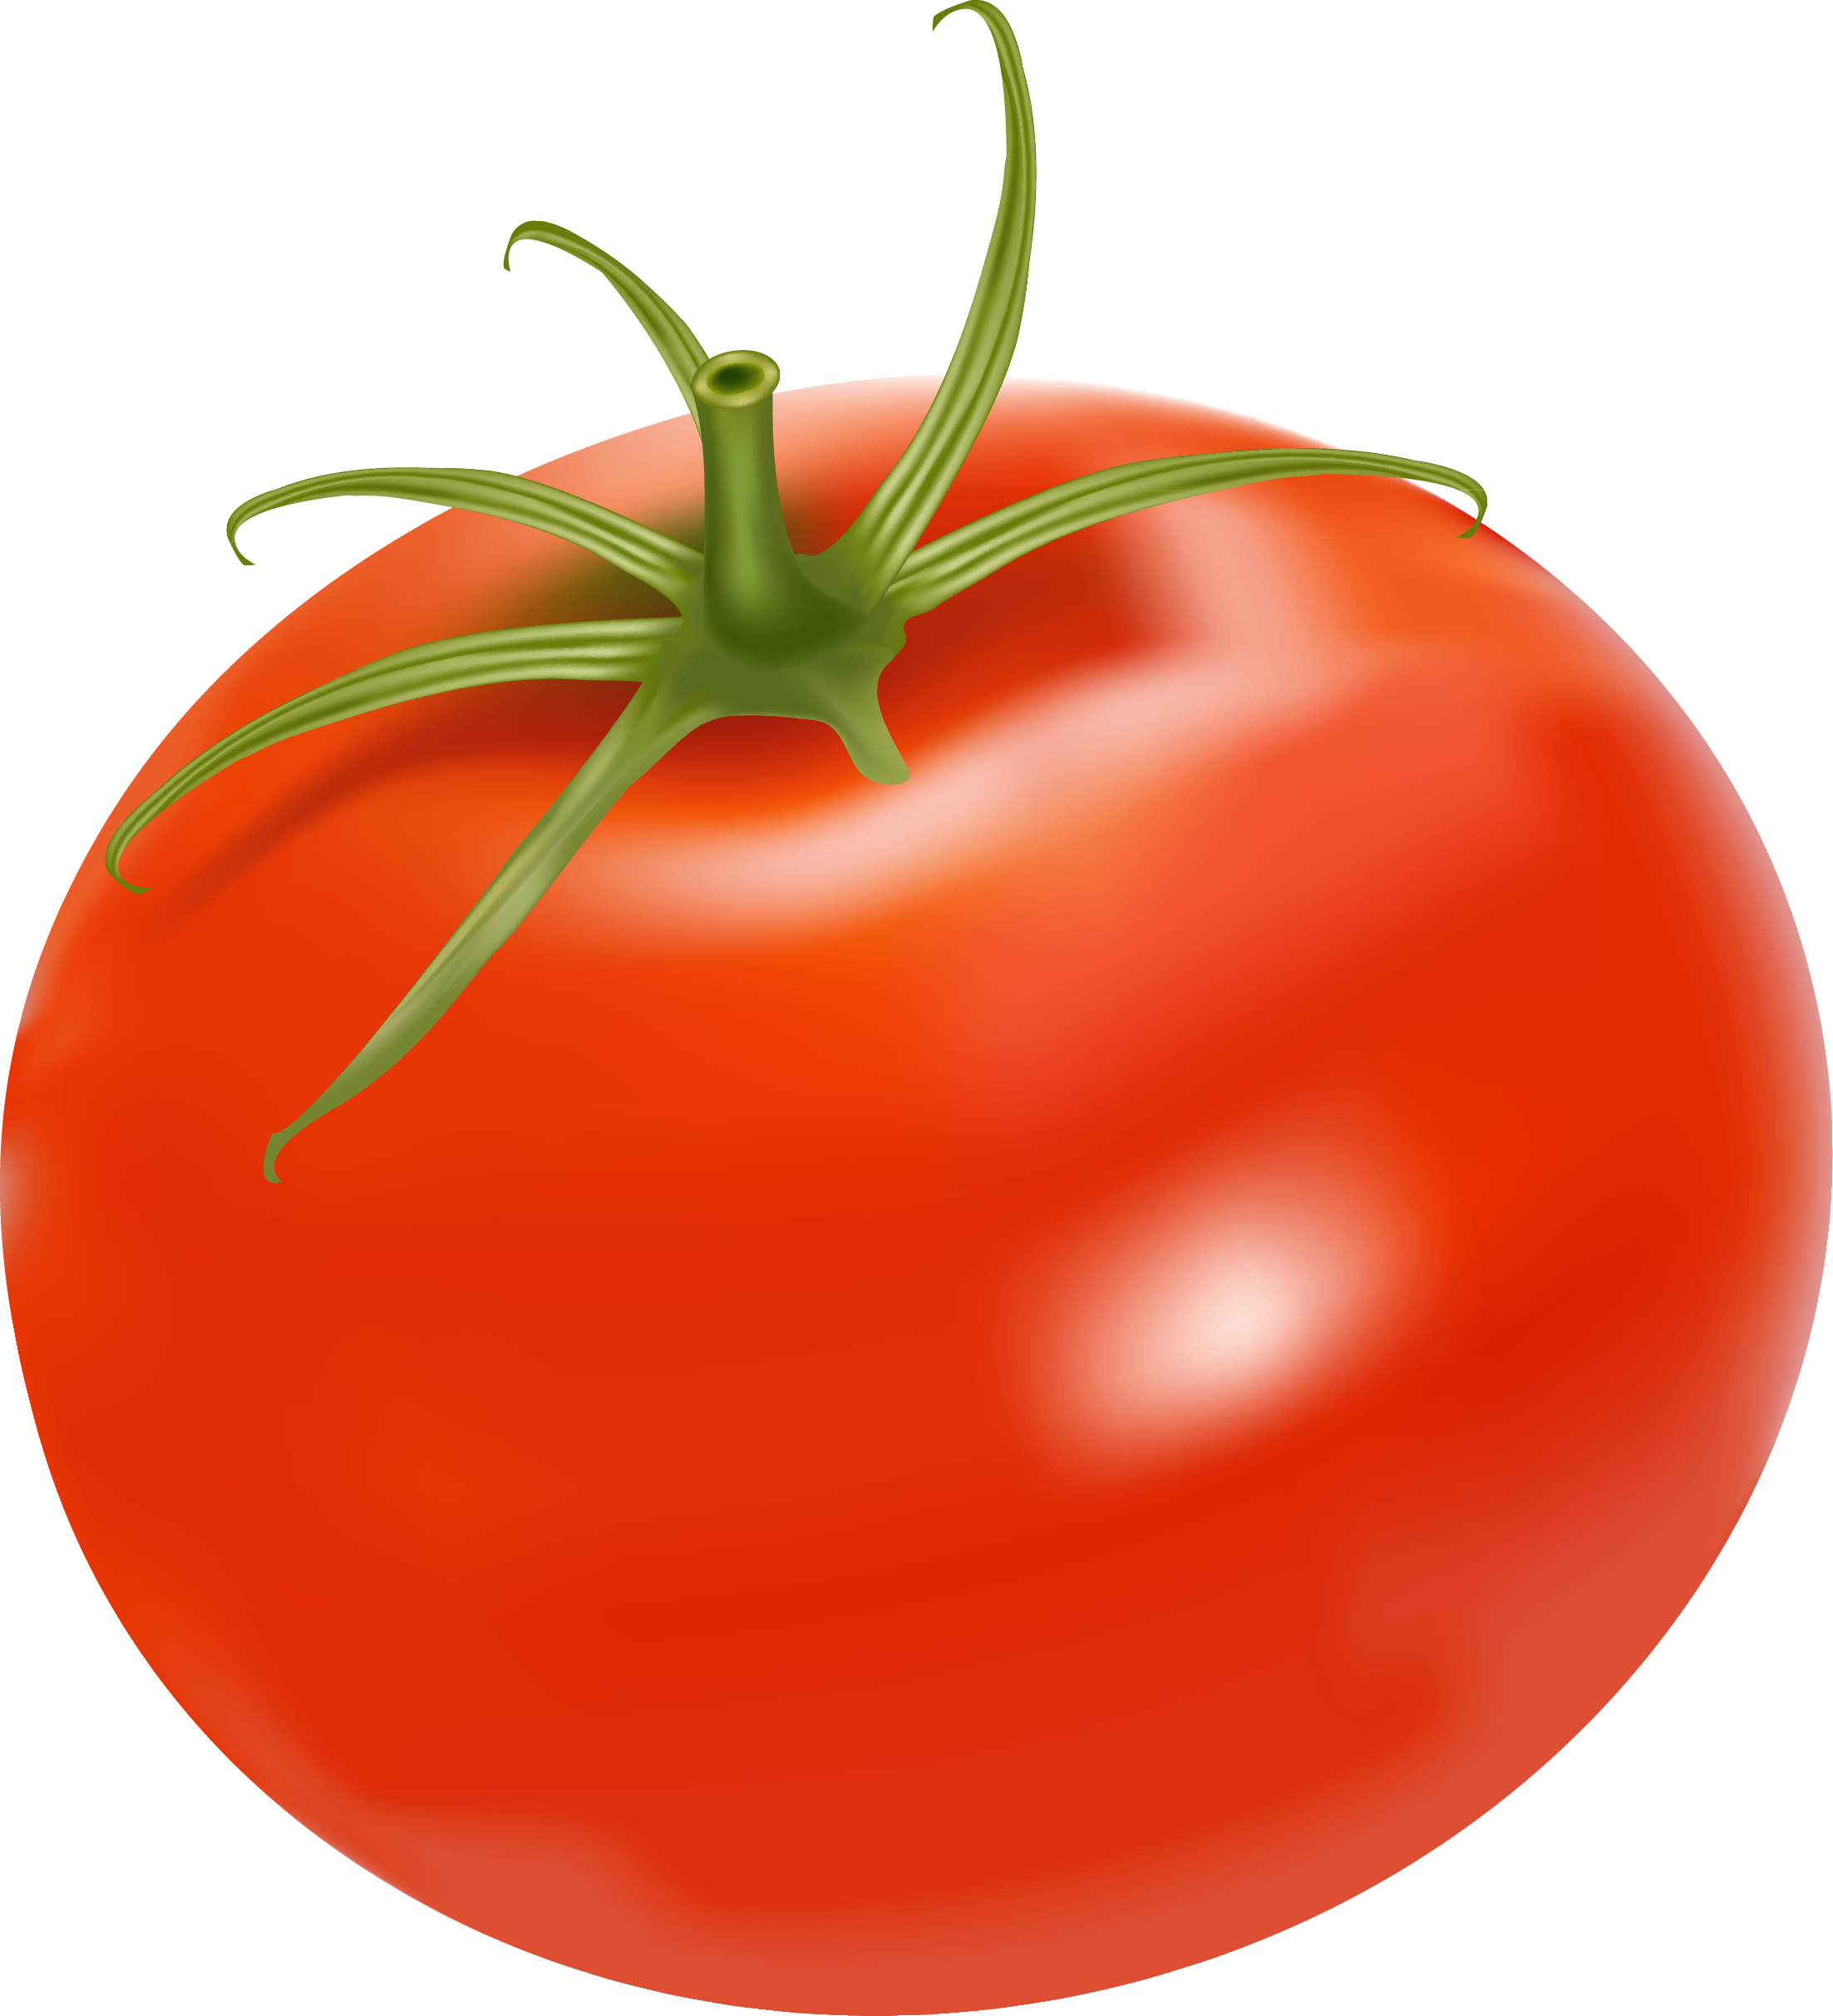 Plum tomato chicken salad. Tomatoes clipart potato